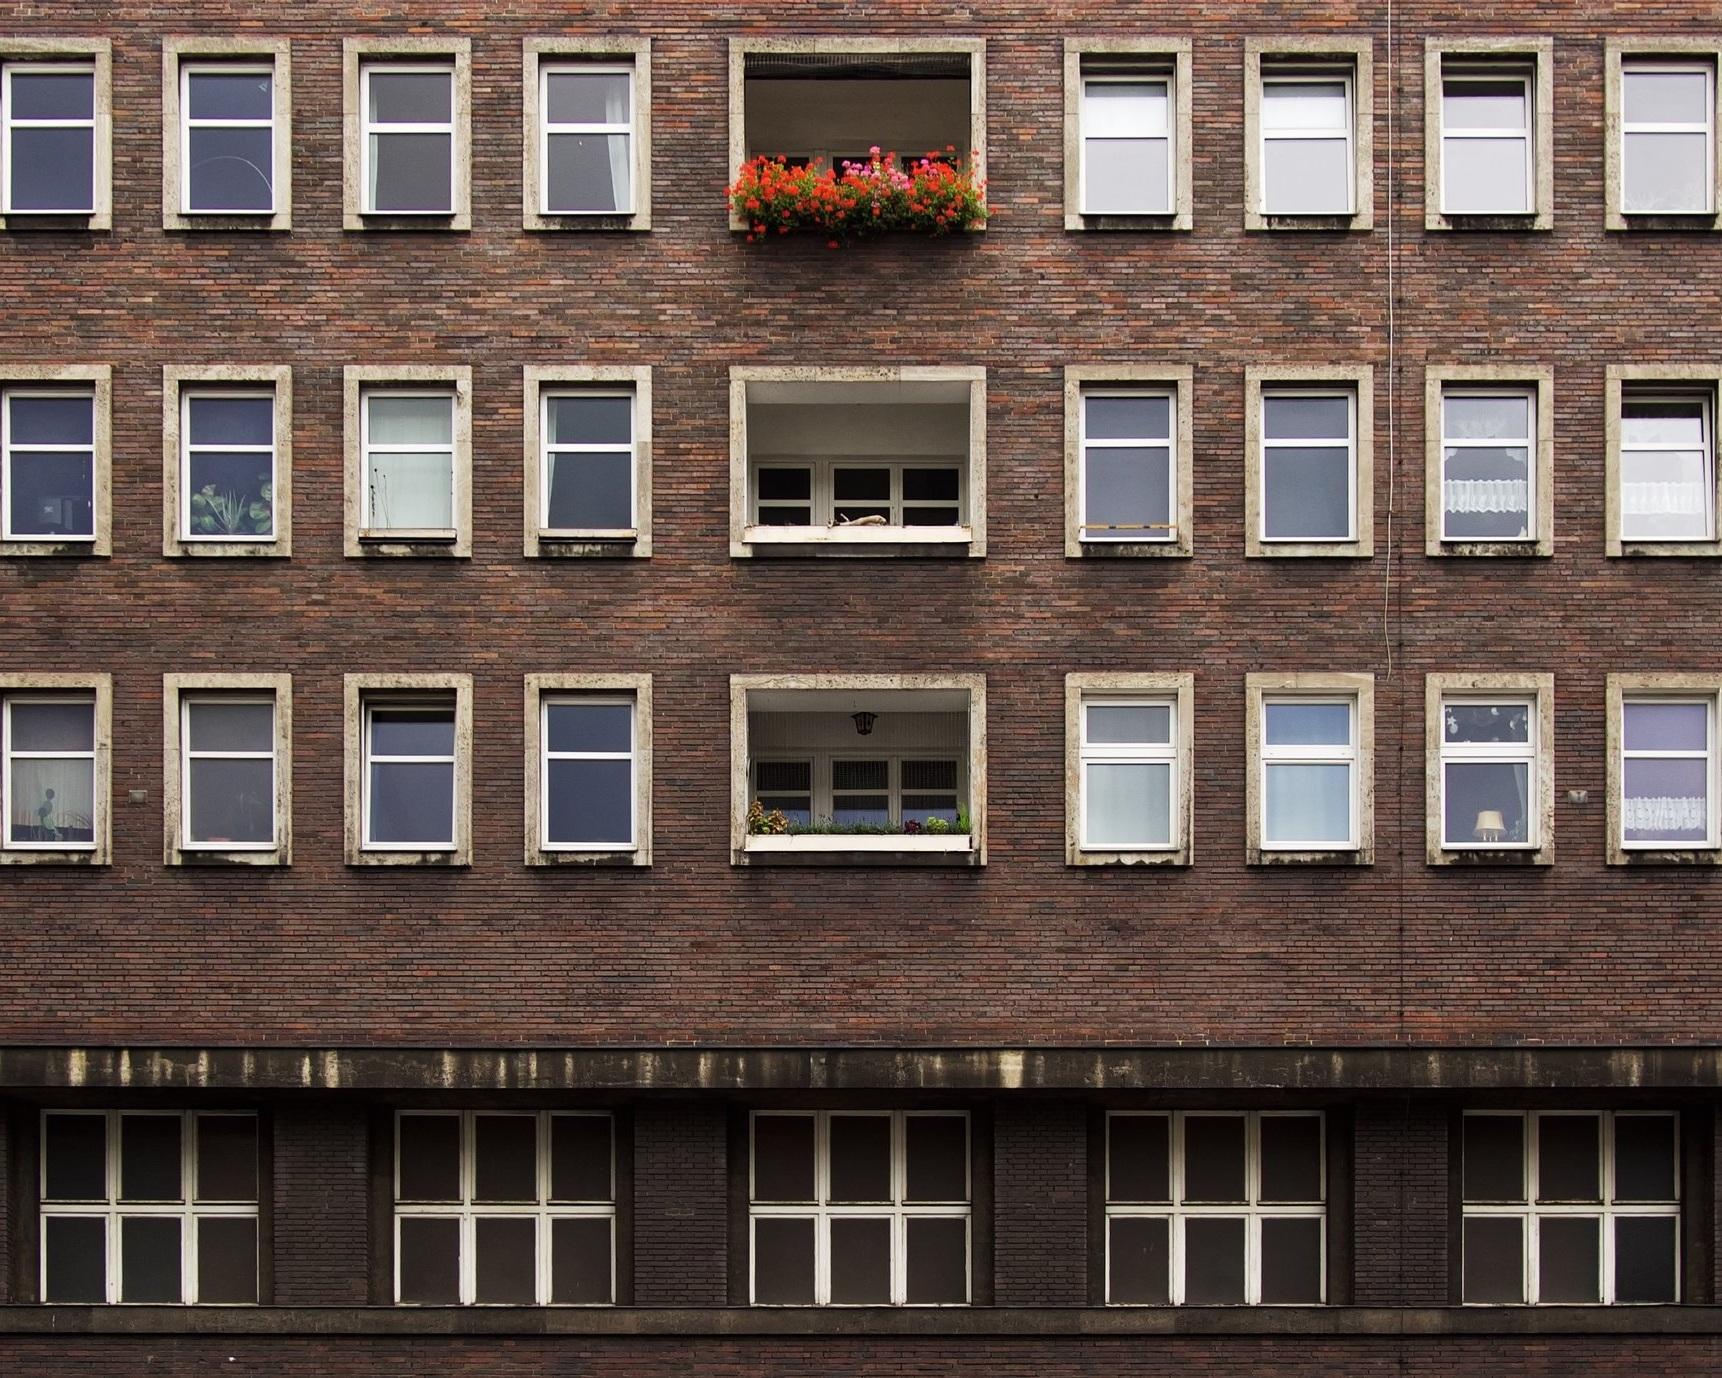 locate housing near transit & jobs -